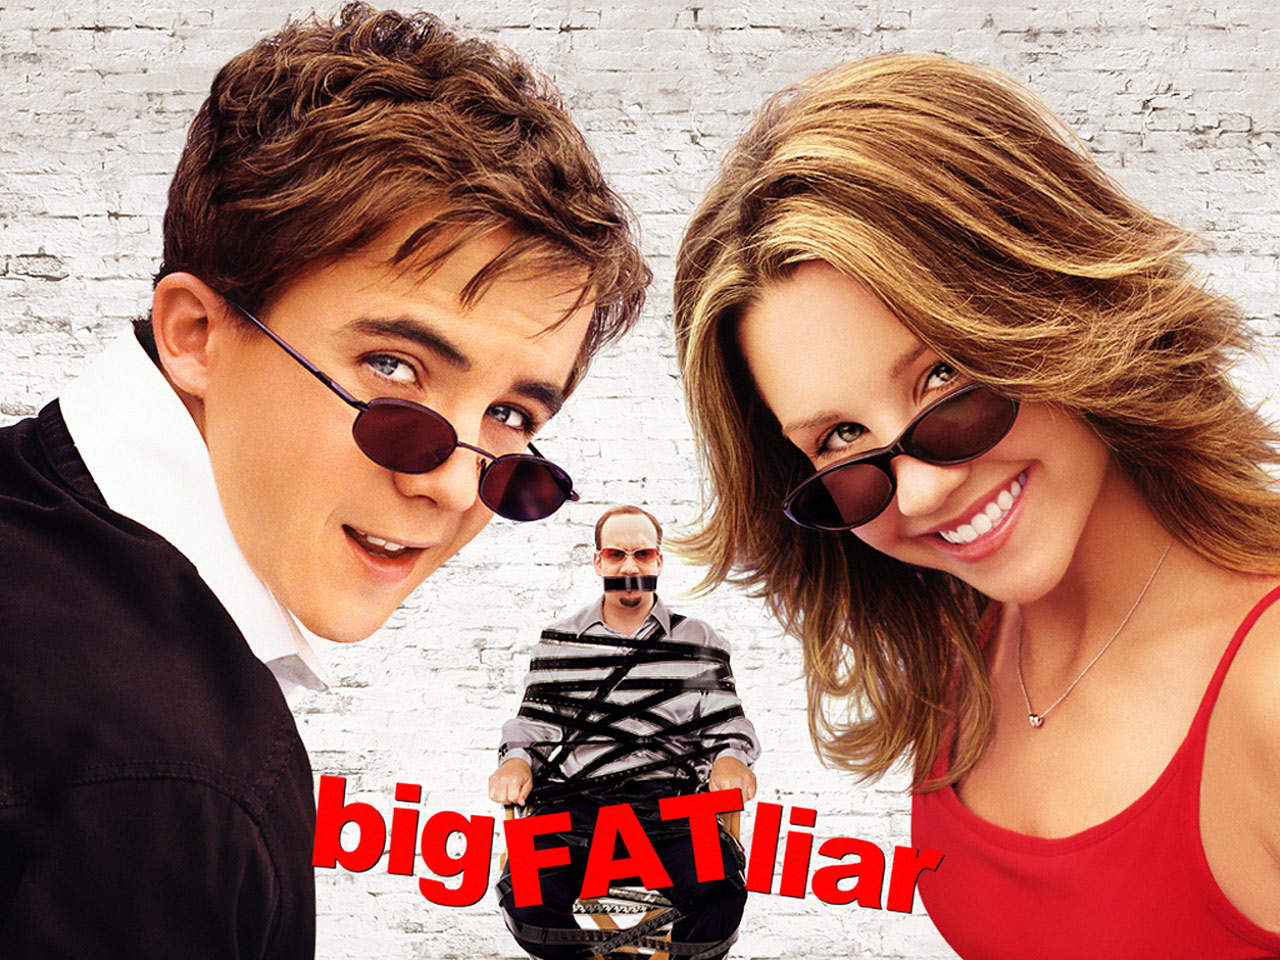 http://4.bp.blogspot.com/-bPn44K-1Z3c/TxRfZ6FdtTI/AAAAAAAABh0/KWWuNGoRtTs/s1600/Big_Fat_Liar%25252C_2002%25252C_Frankie_Muniz%25252C_Amanda_Bynes.jpg